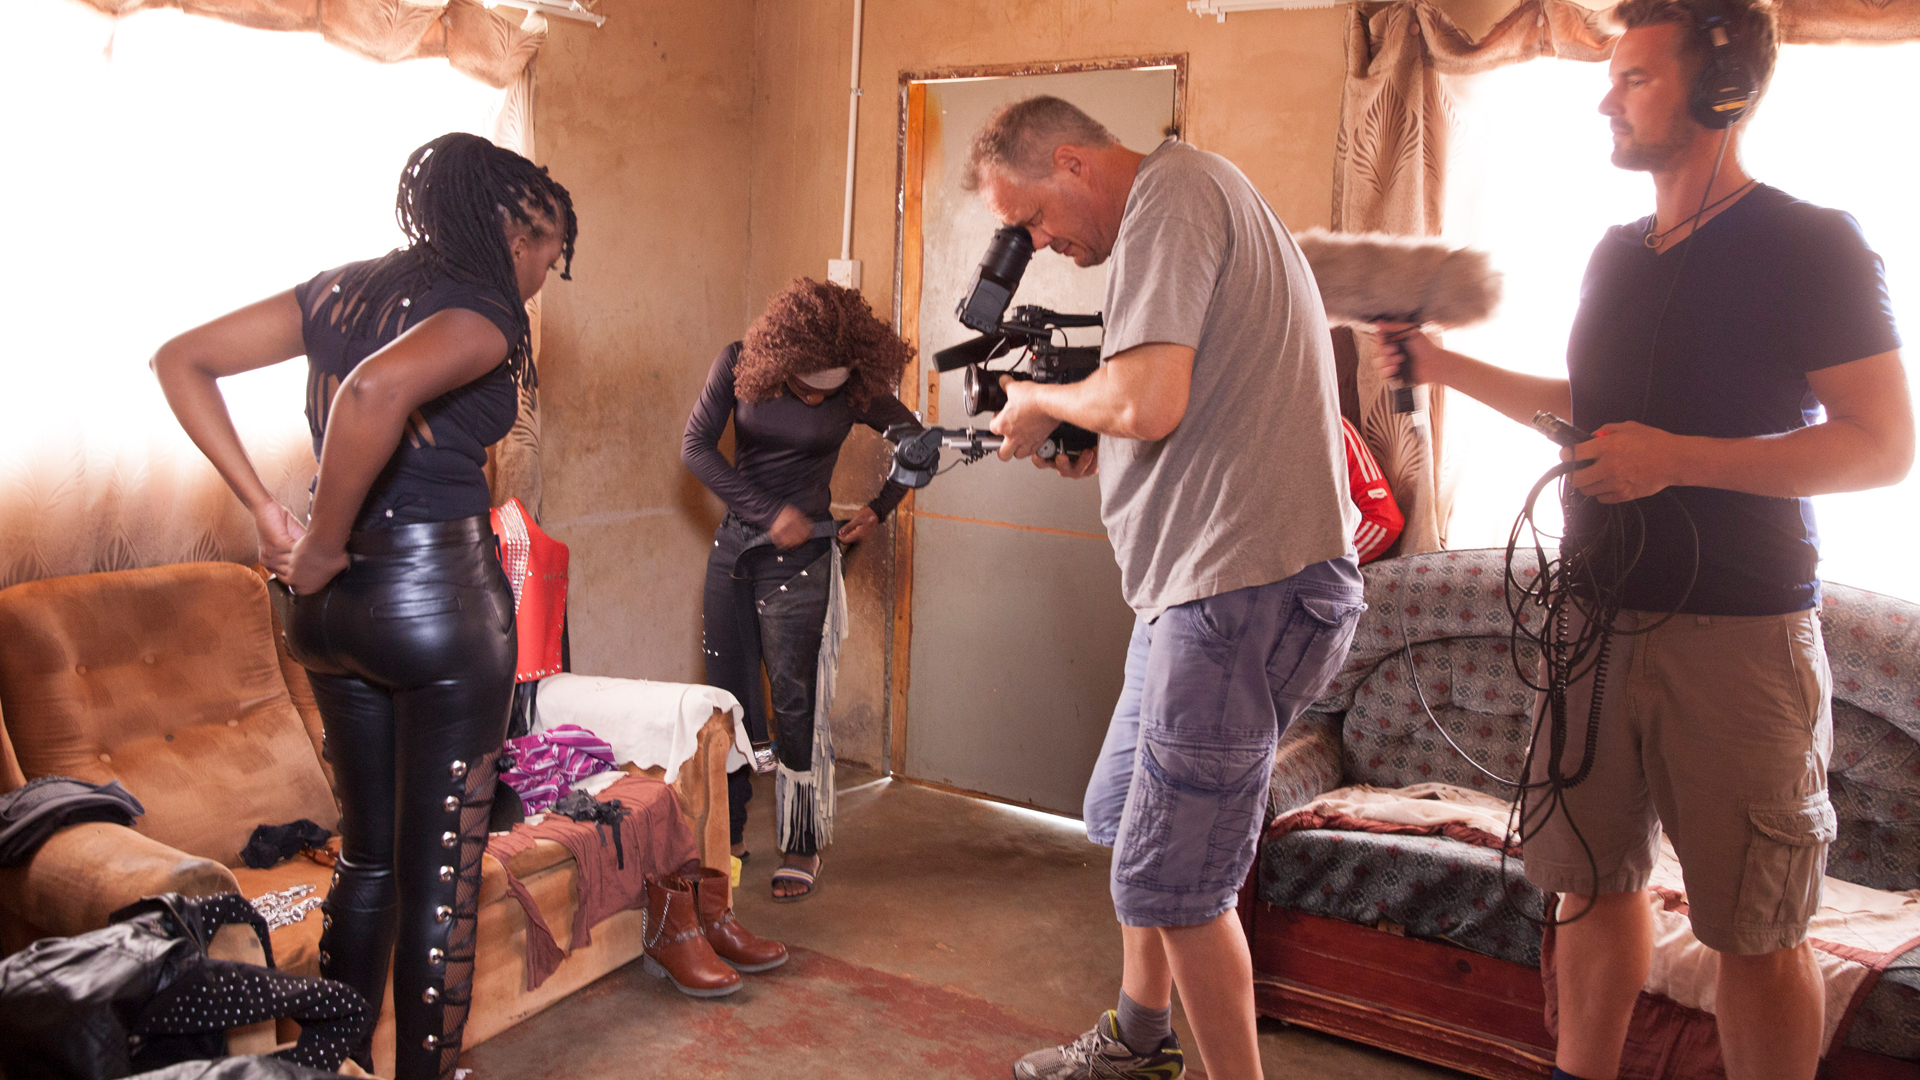 Arte Documentary - Queens of Botswana - Making of Image 9